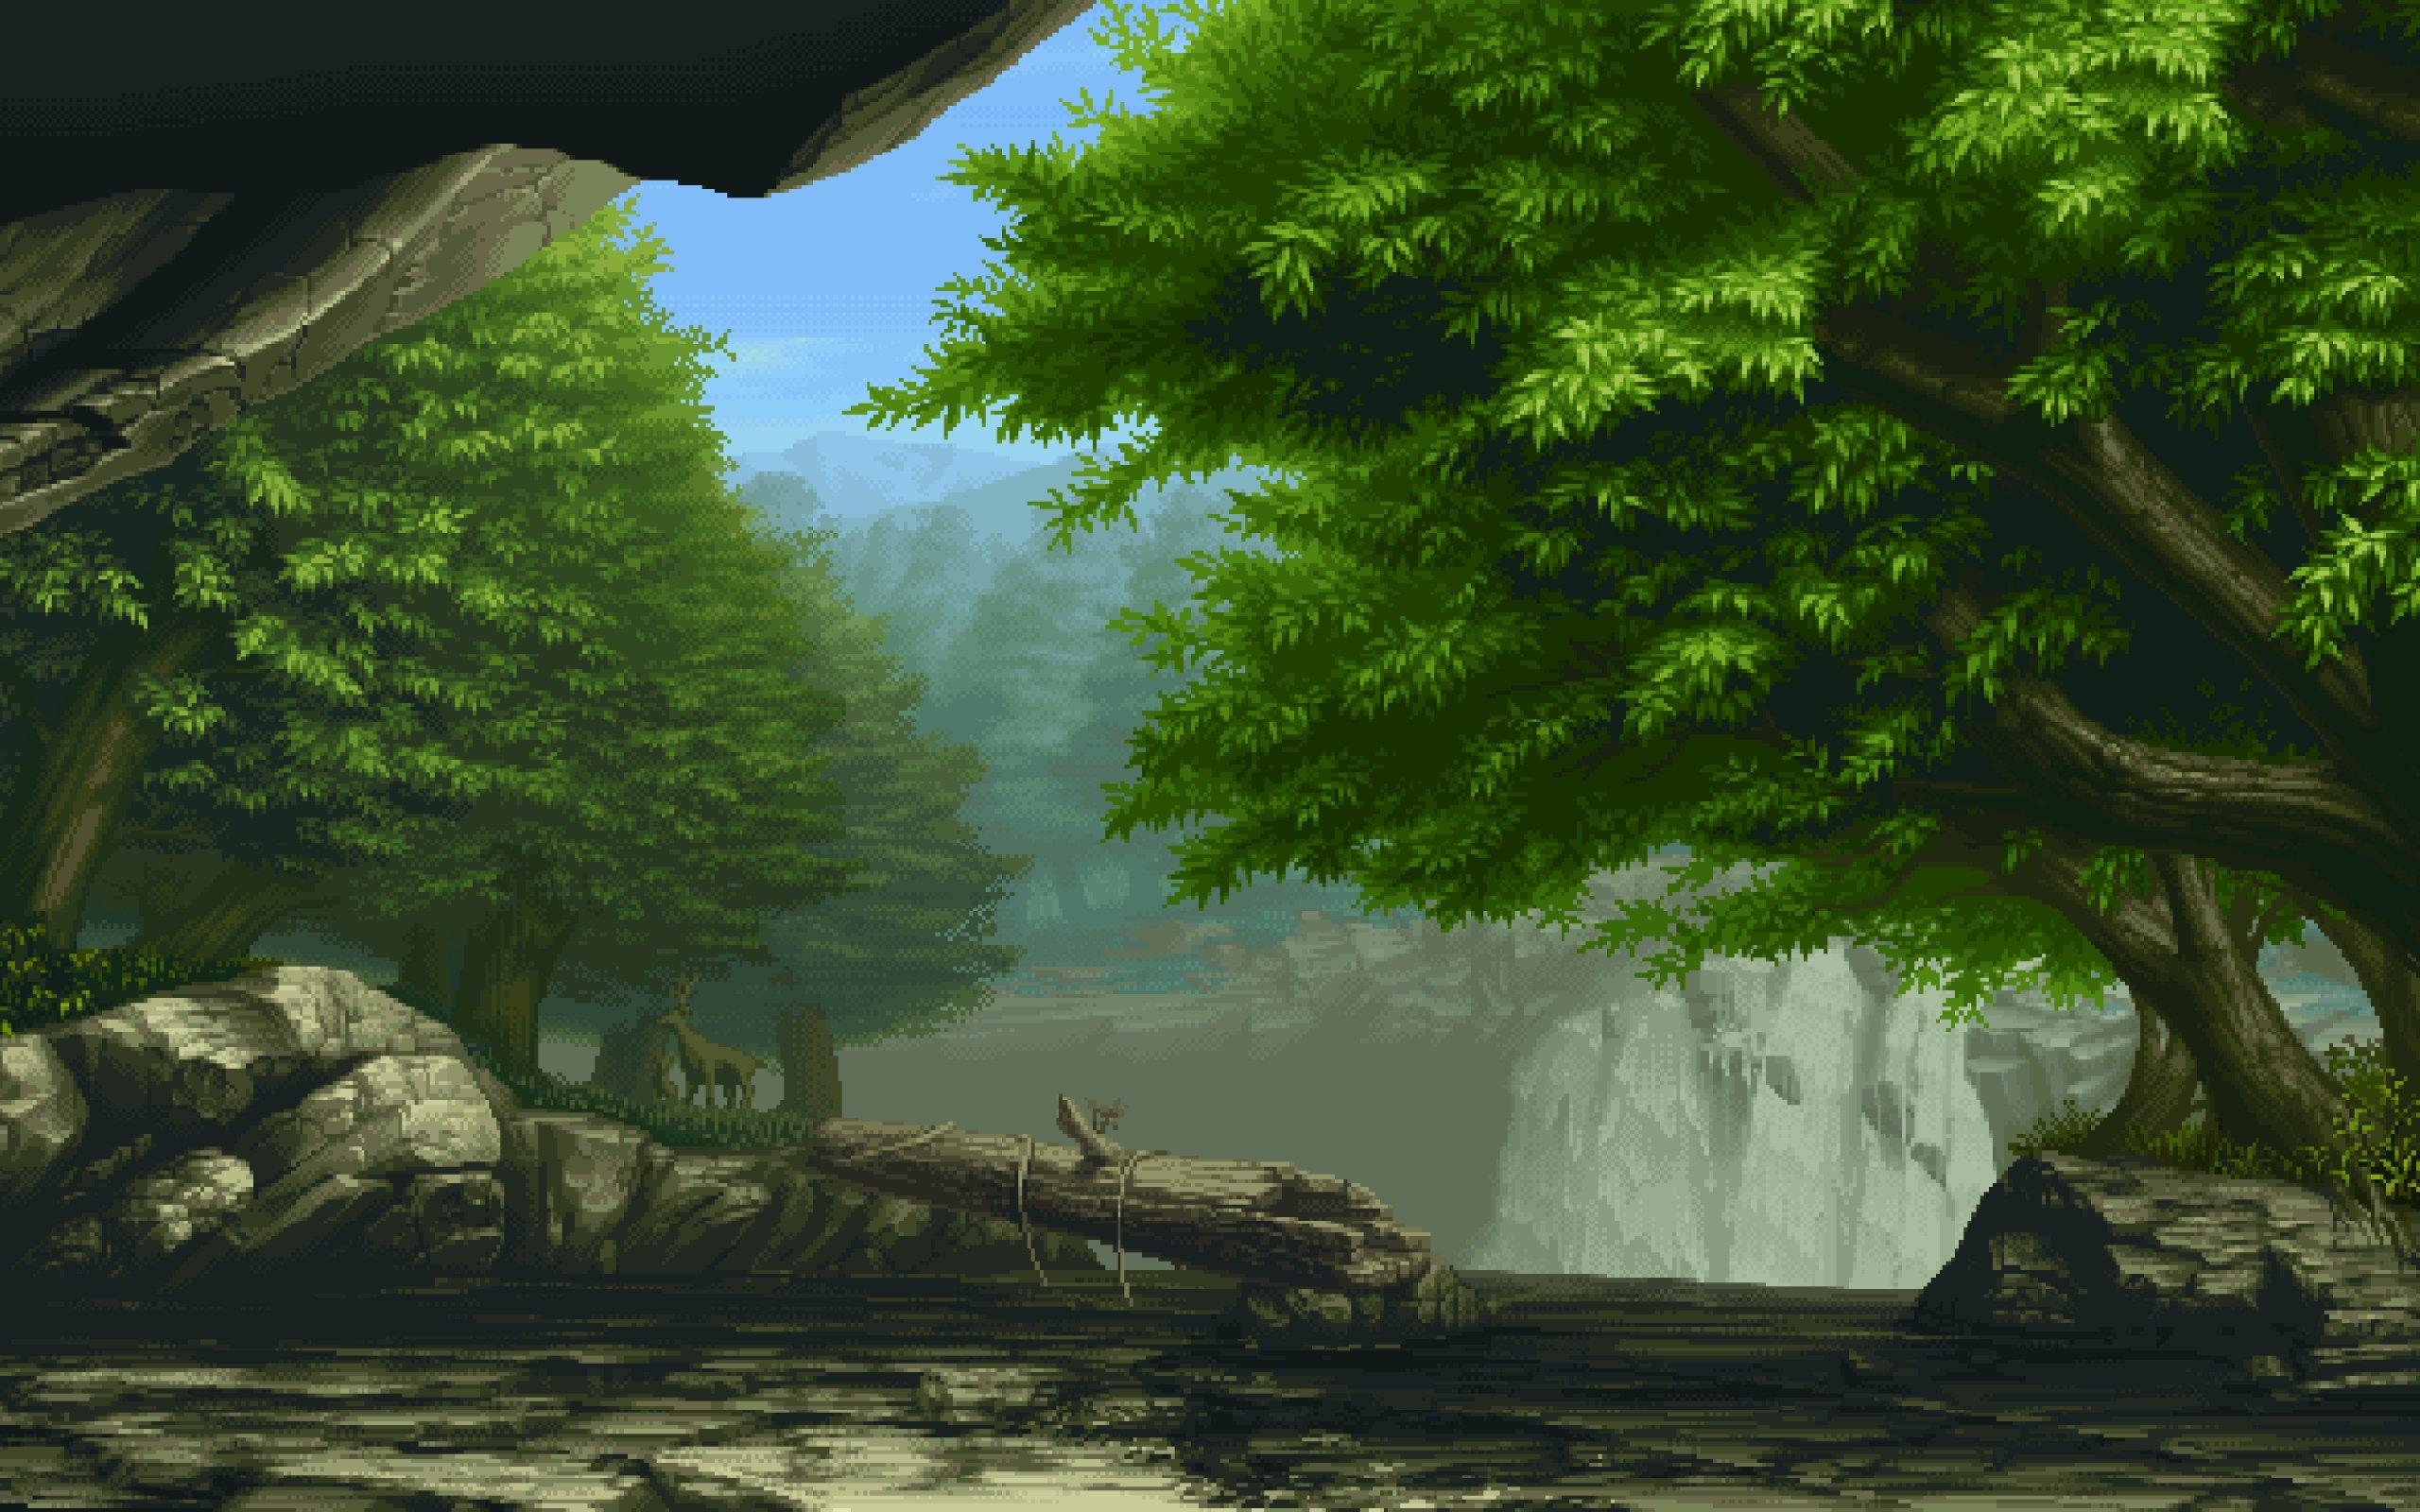 3d Fireflies Live Wallpaper Fantasy Landscape Art Artwork Nature Scenery Wallpaper